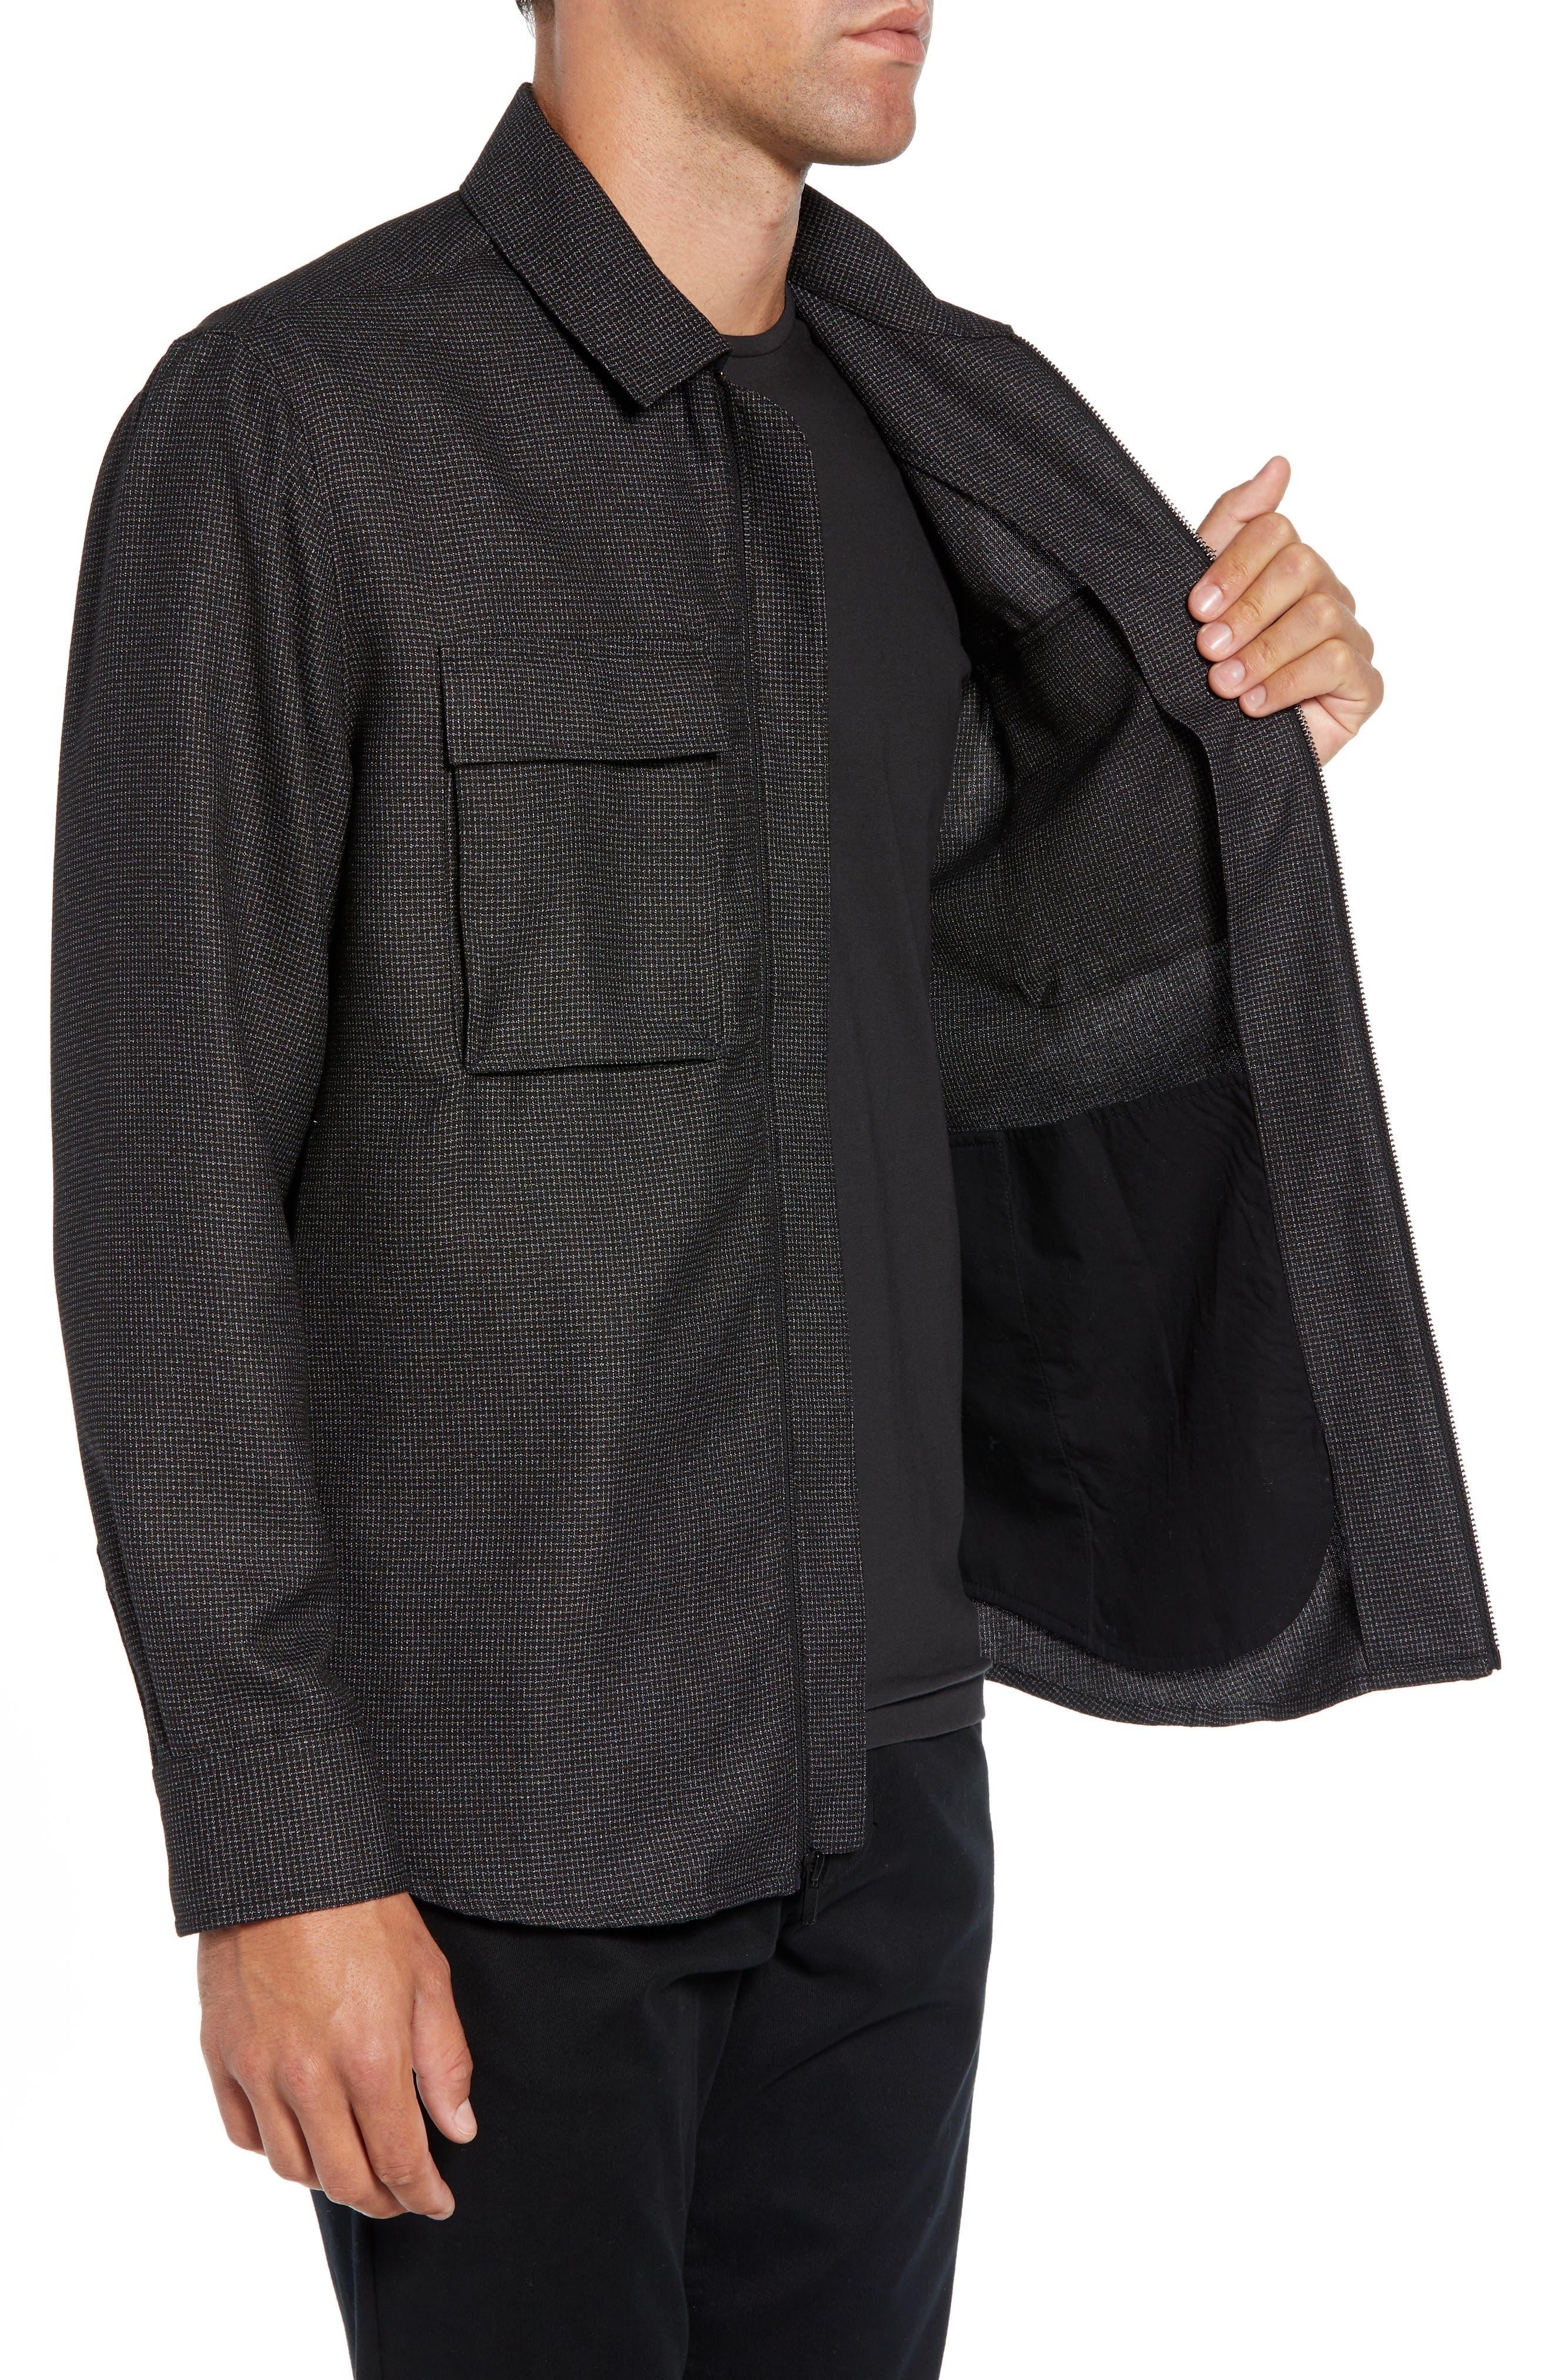 Grid Zip Shirt Jacket,                             Alternate thumbnail 3, color,                             BLACK WHITE GRID